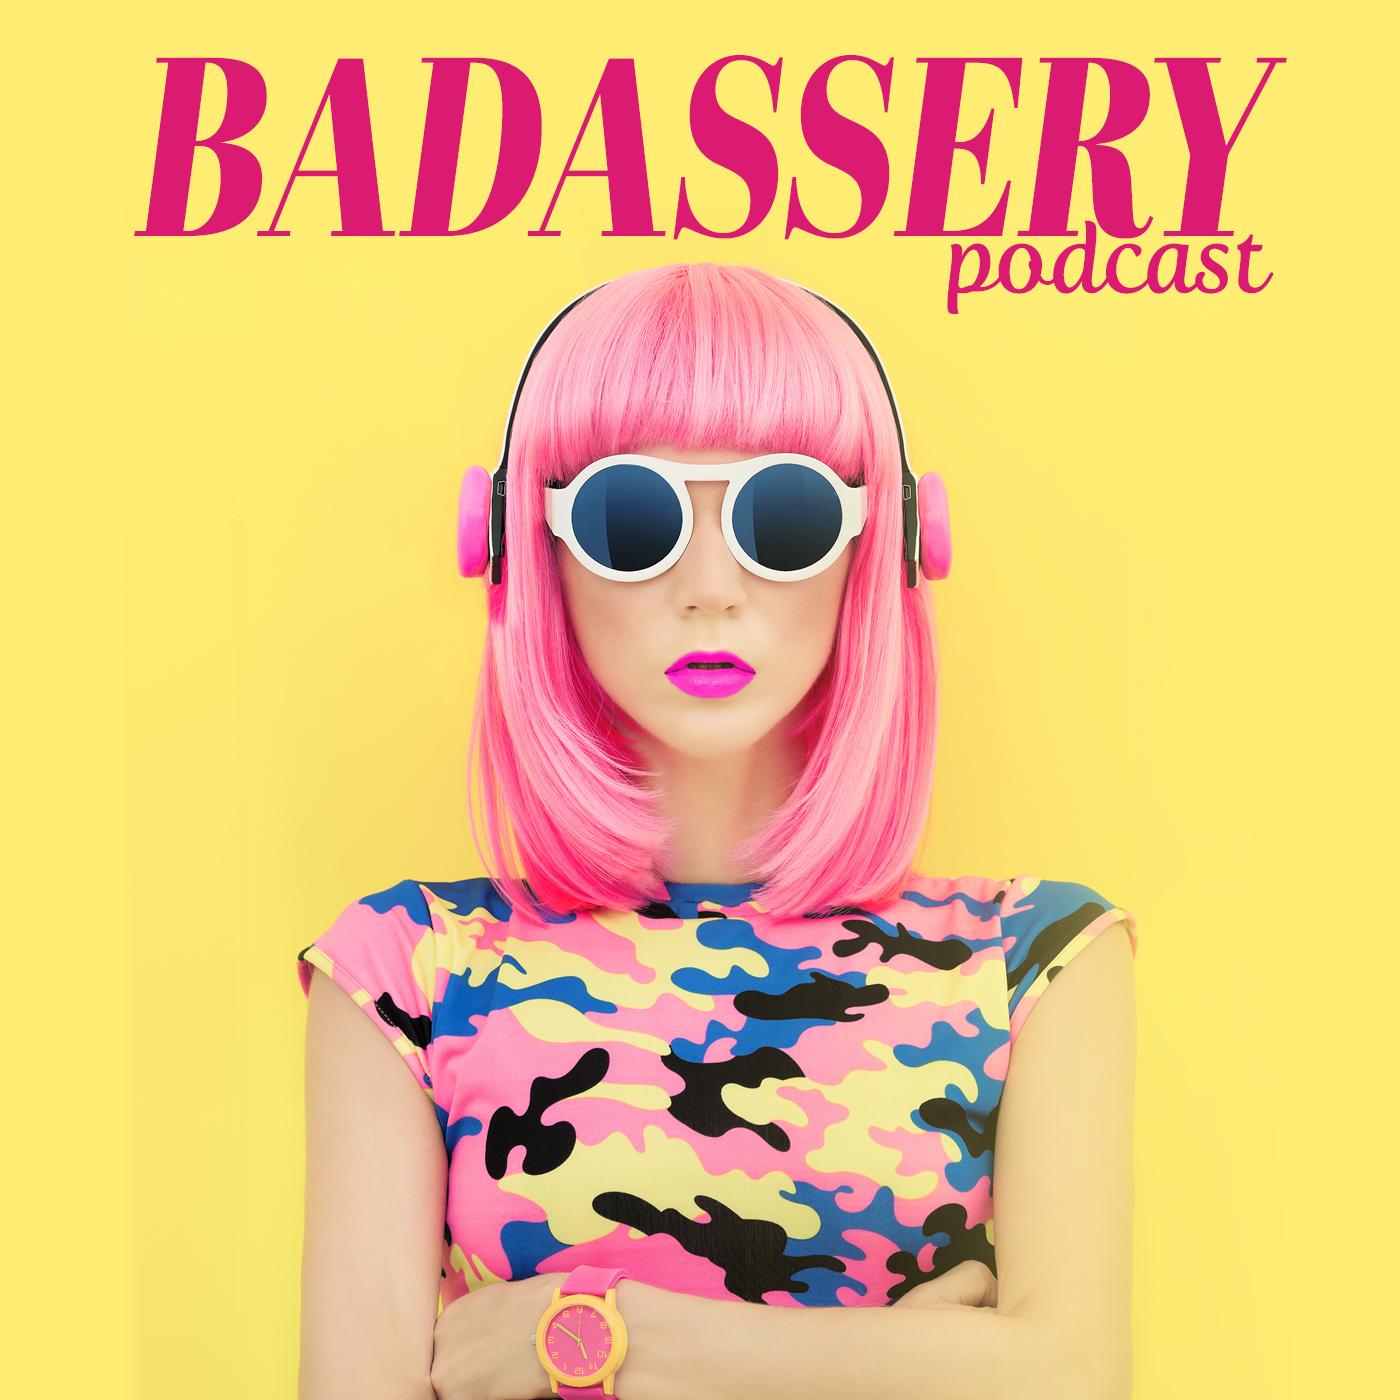 Badassery Podcast show art